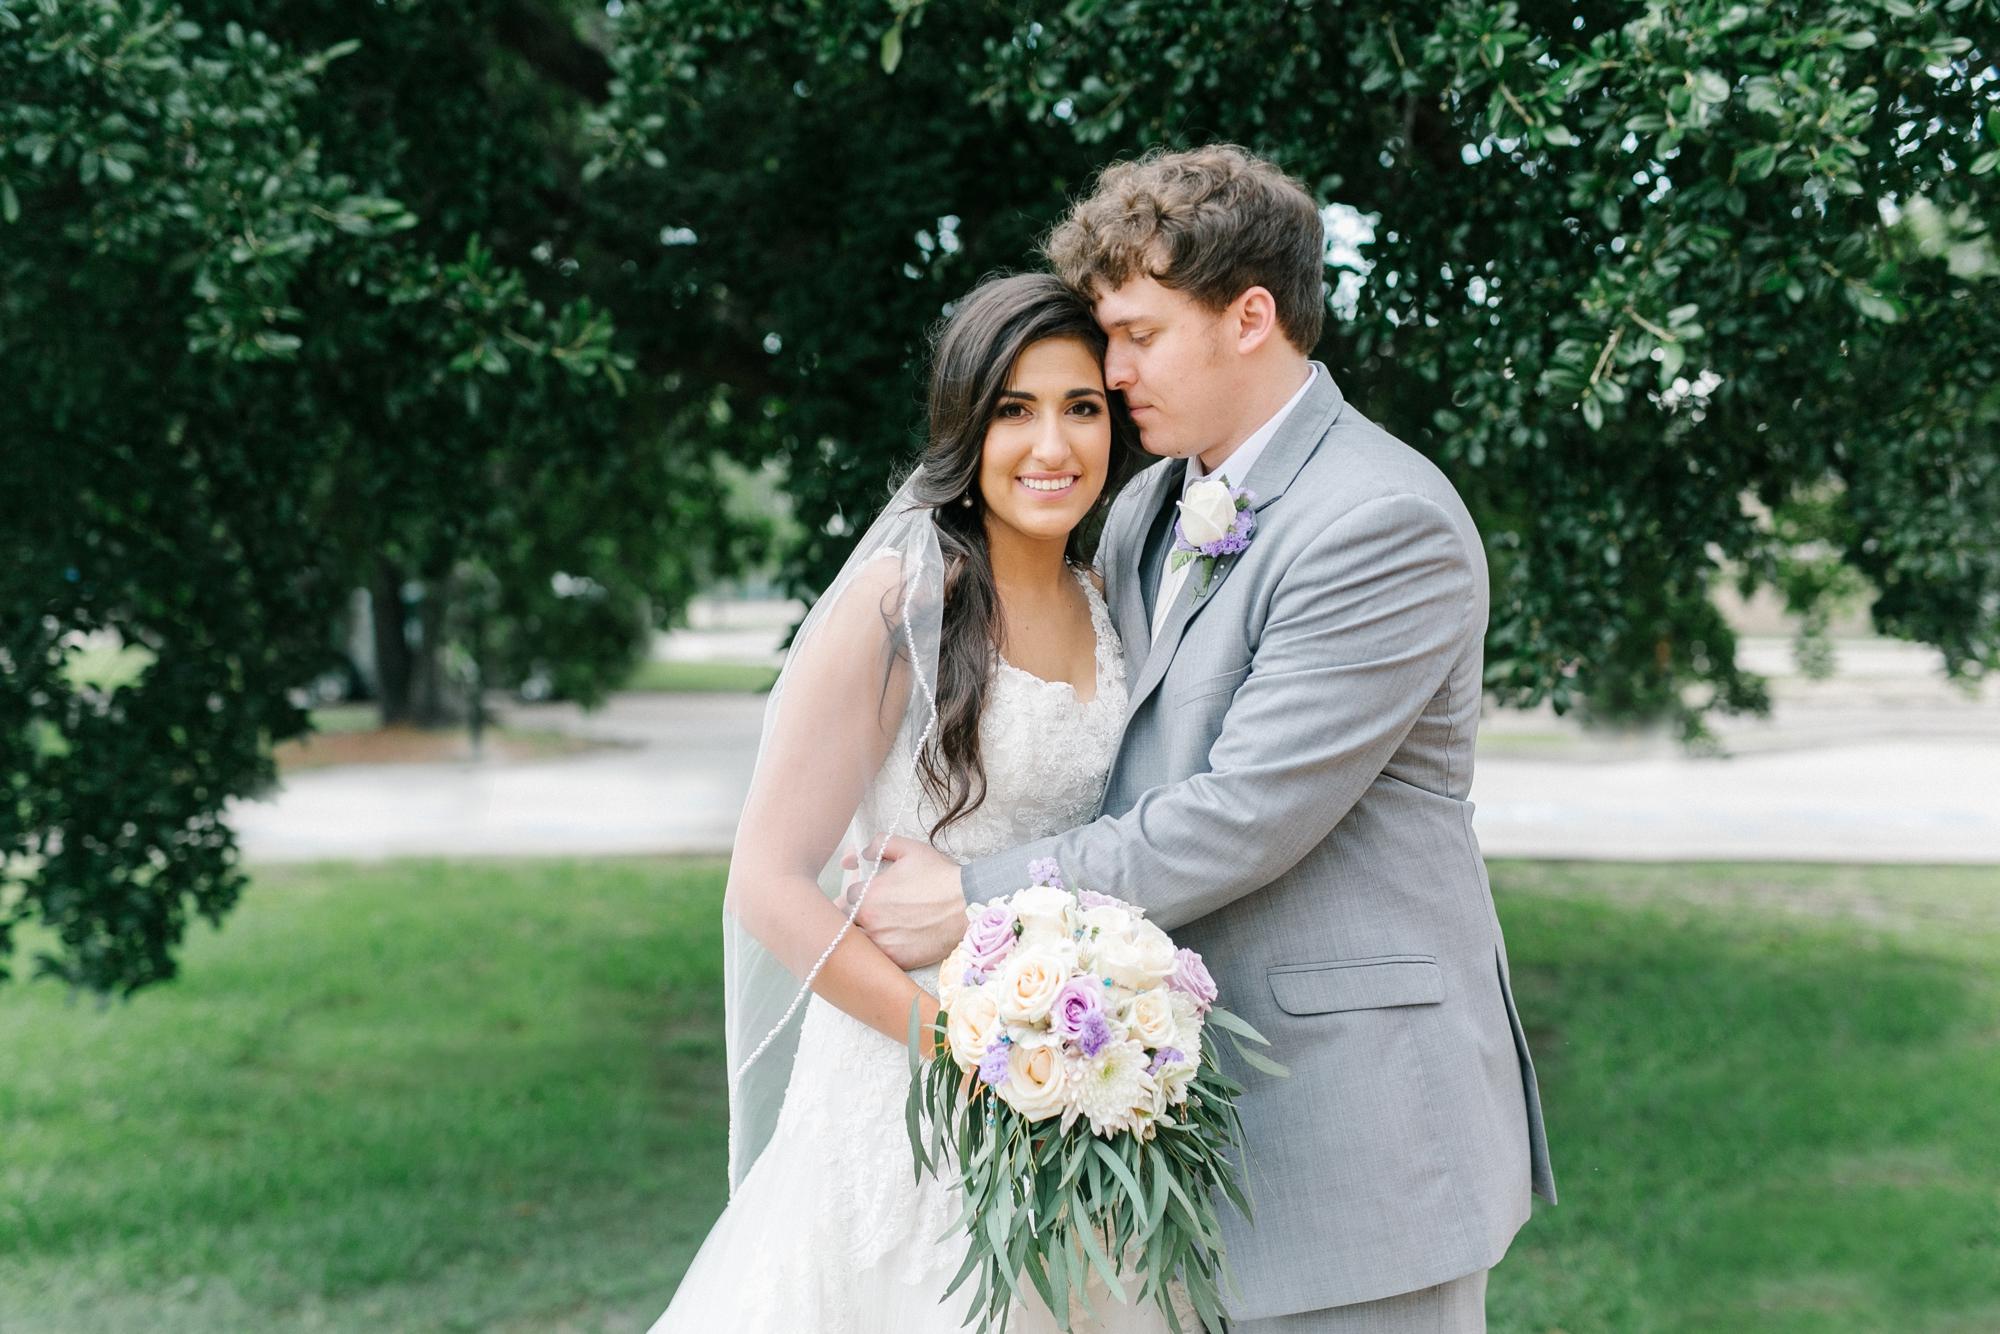 New_Orleans_Wedding_Photographer_1388.jpg